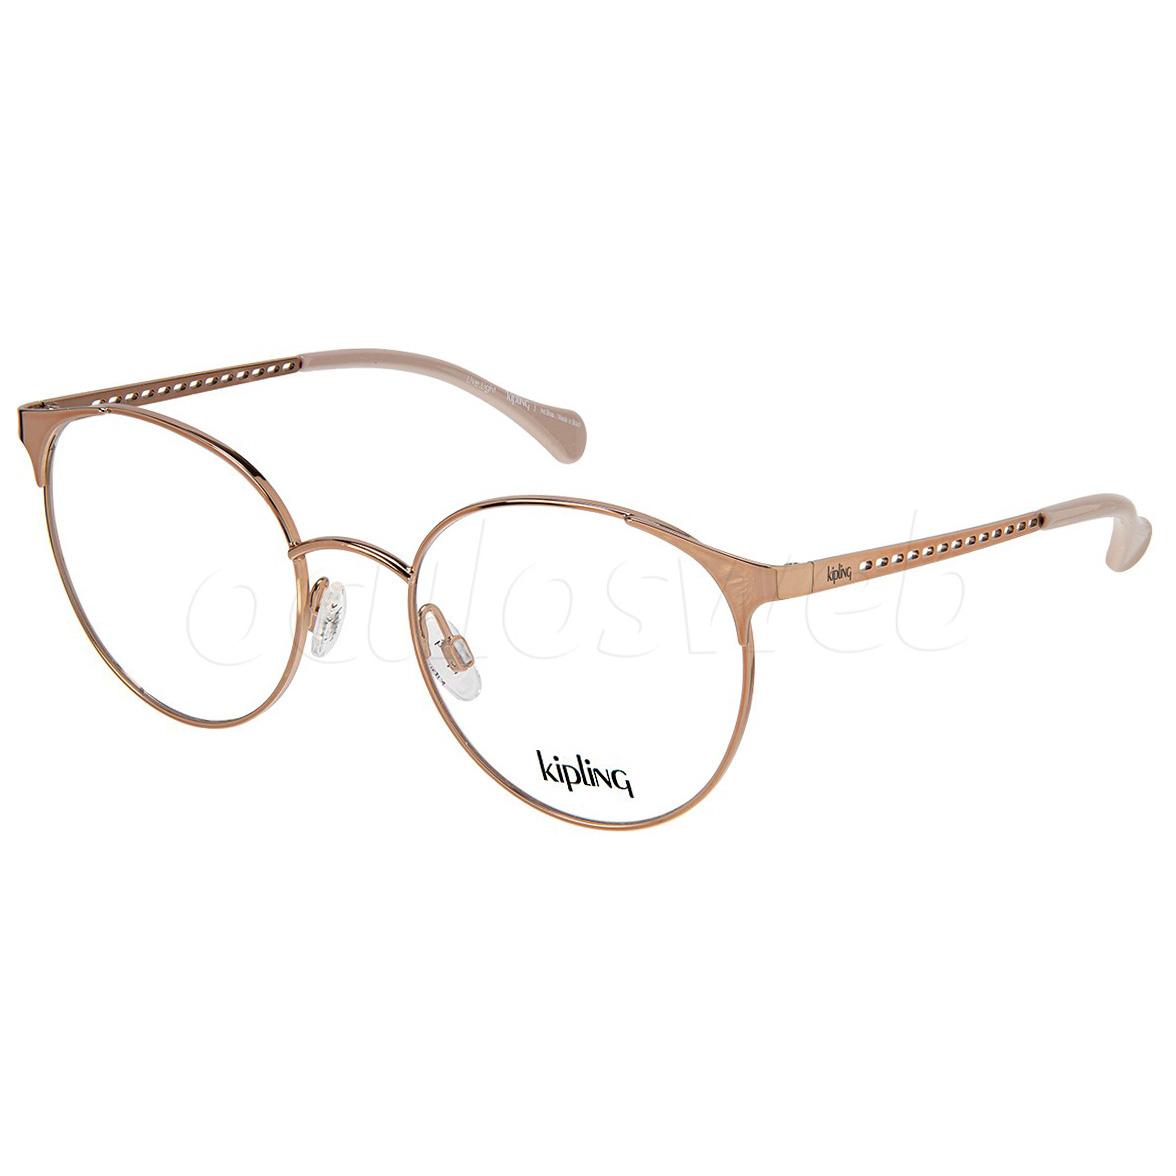 Óculos de Grau Feminino Kipling KP1112 Metal Dourado Rose Brilho